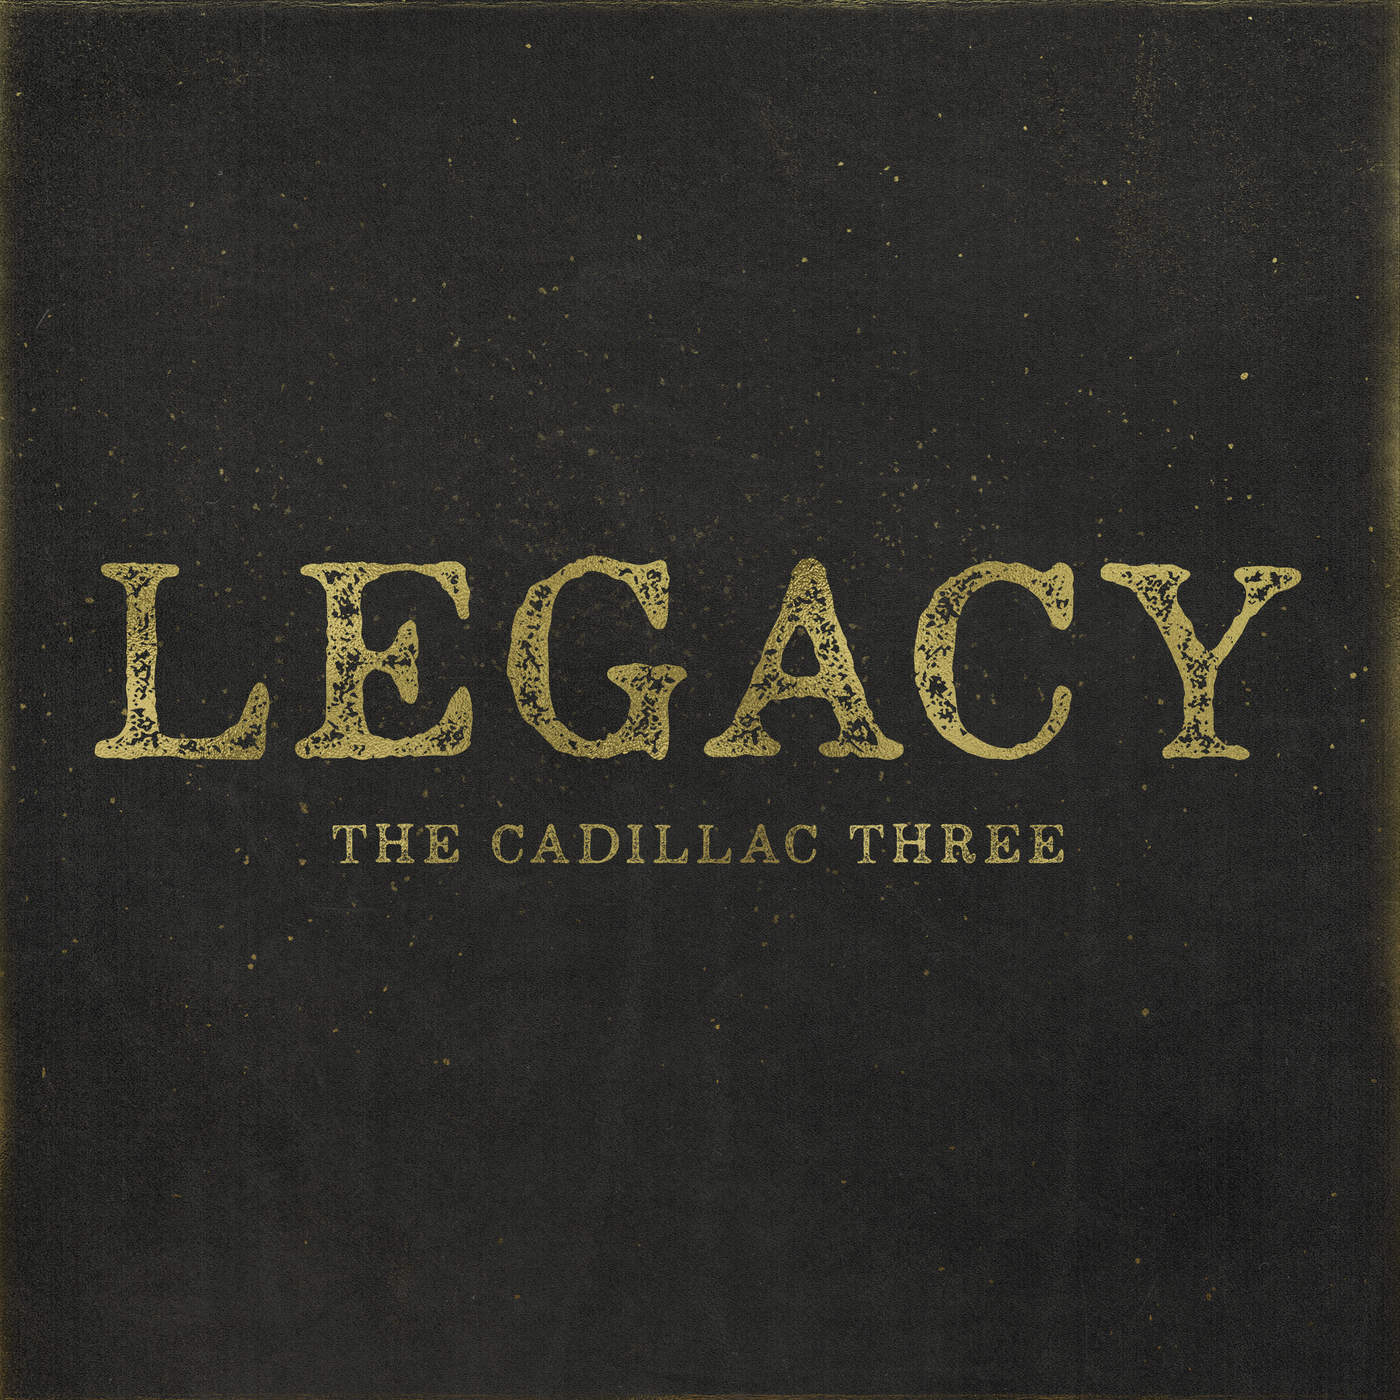 The Cadillac Three - Legacy